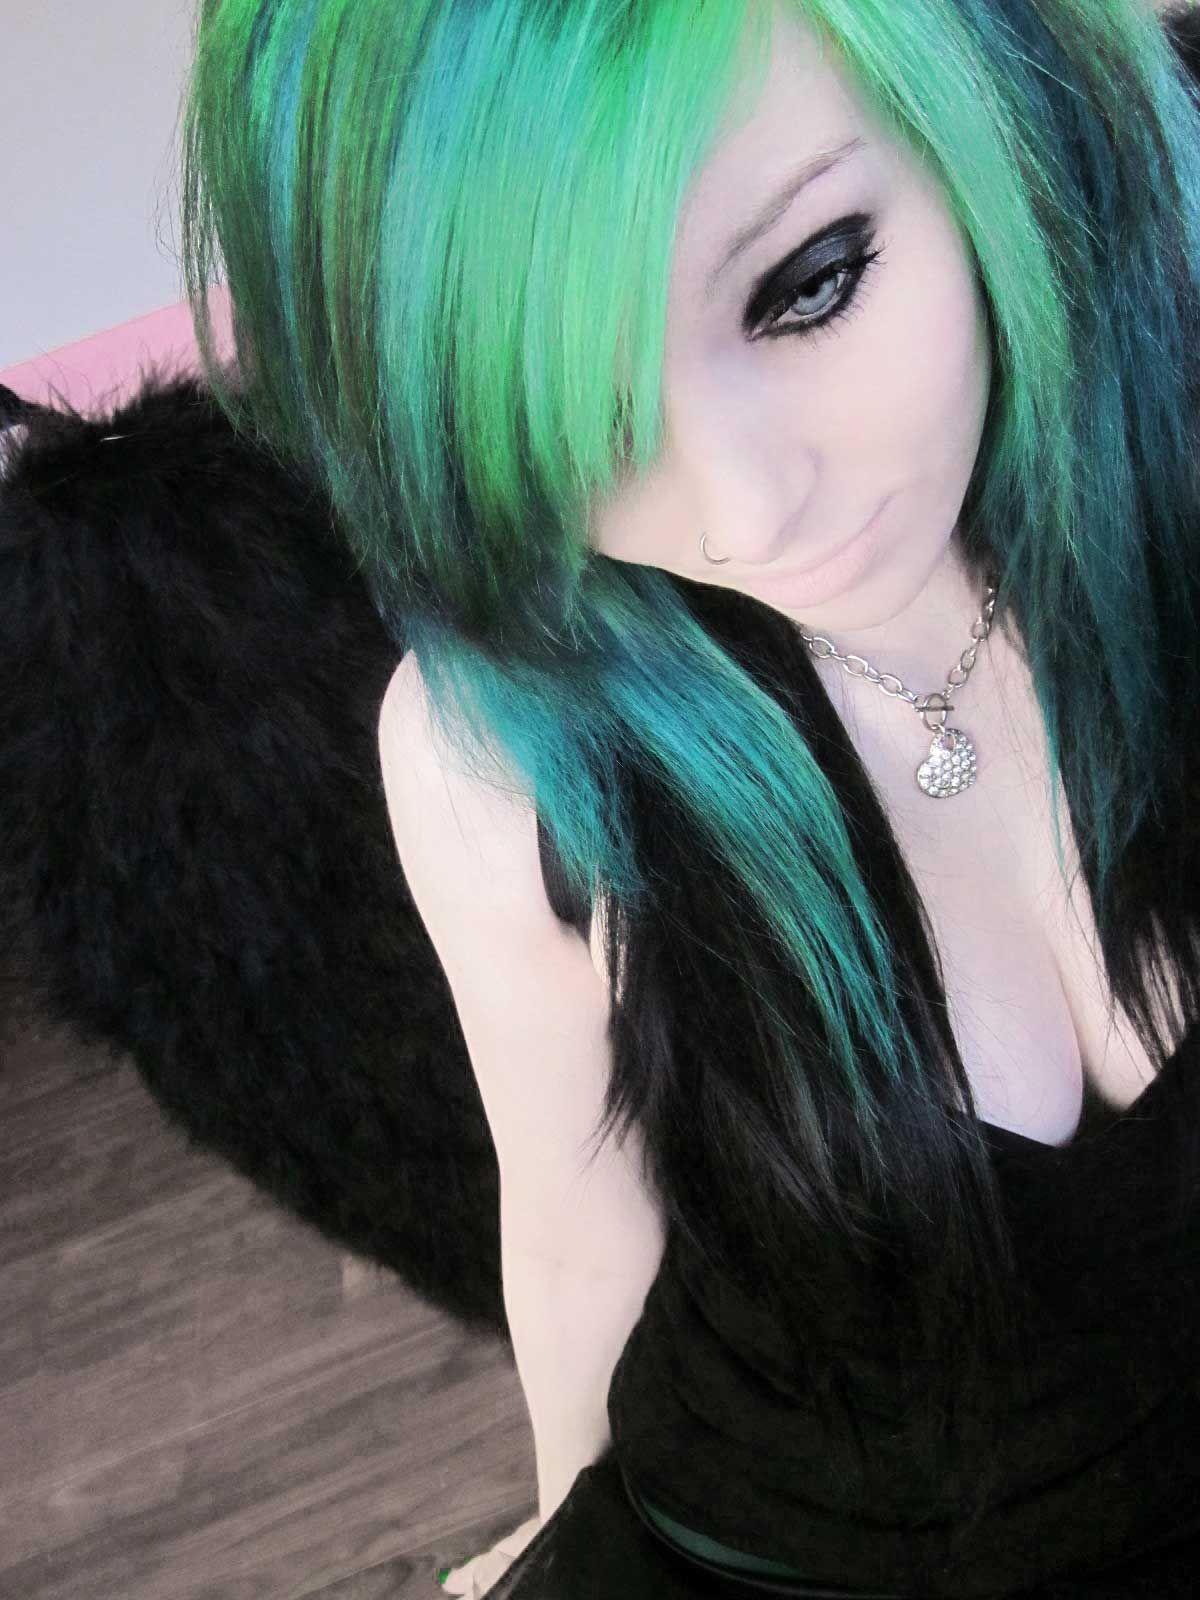 Dark green hair tumblr hairpurplebluepinkgreenredblack